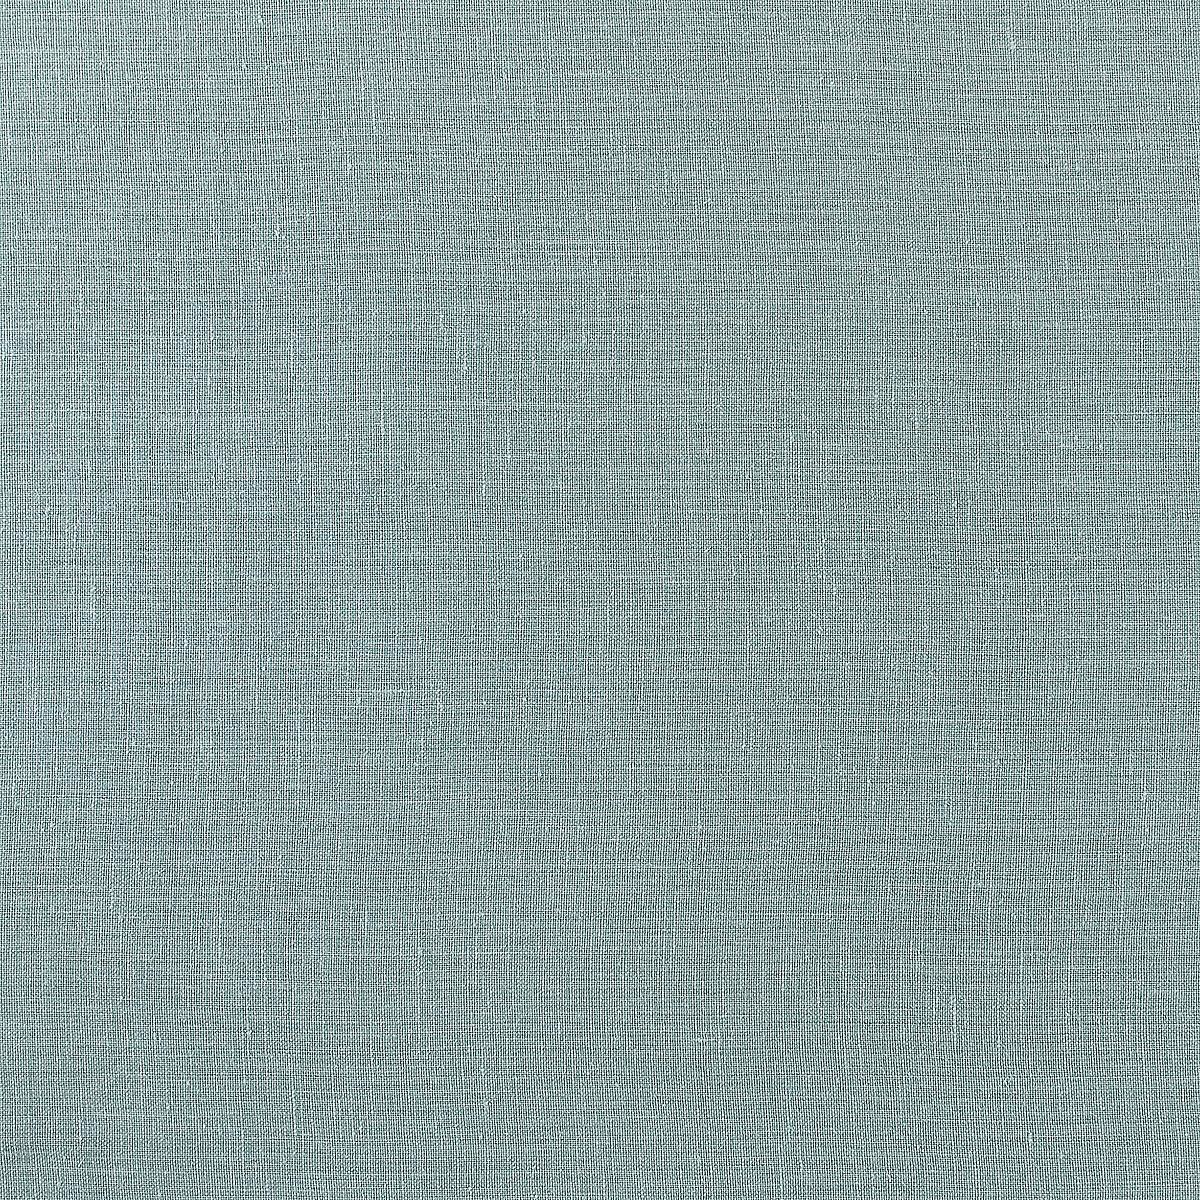 Weathered Linen: Porch (fabric yardage)